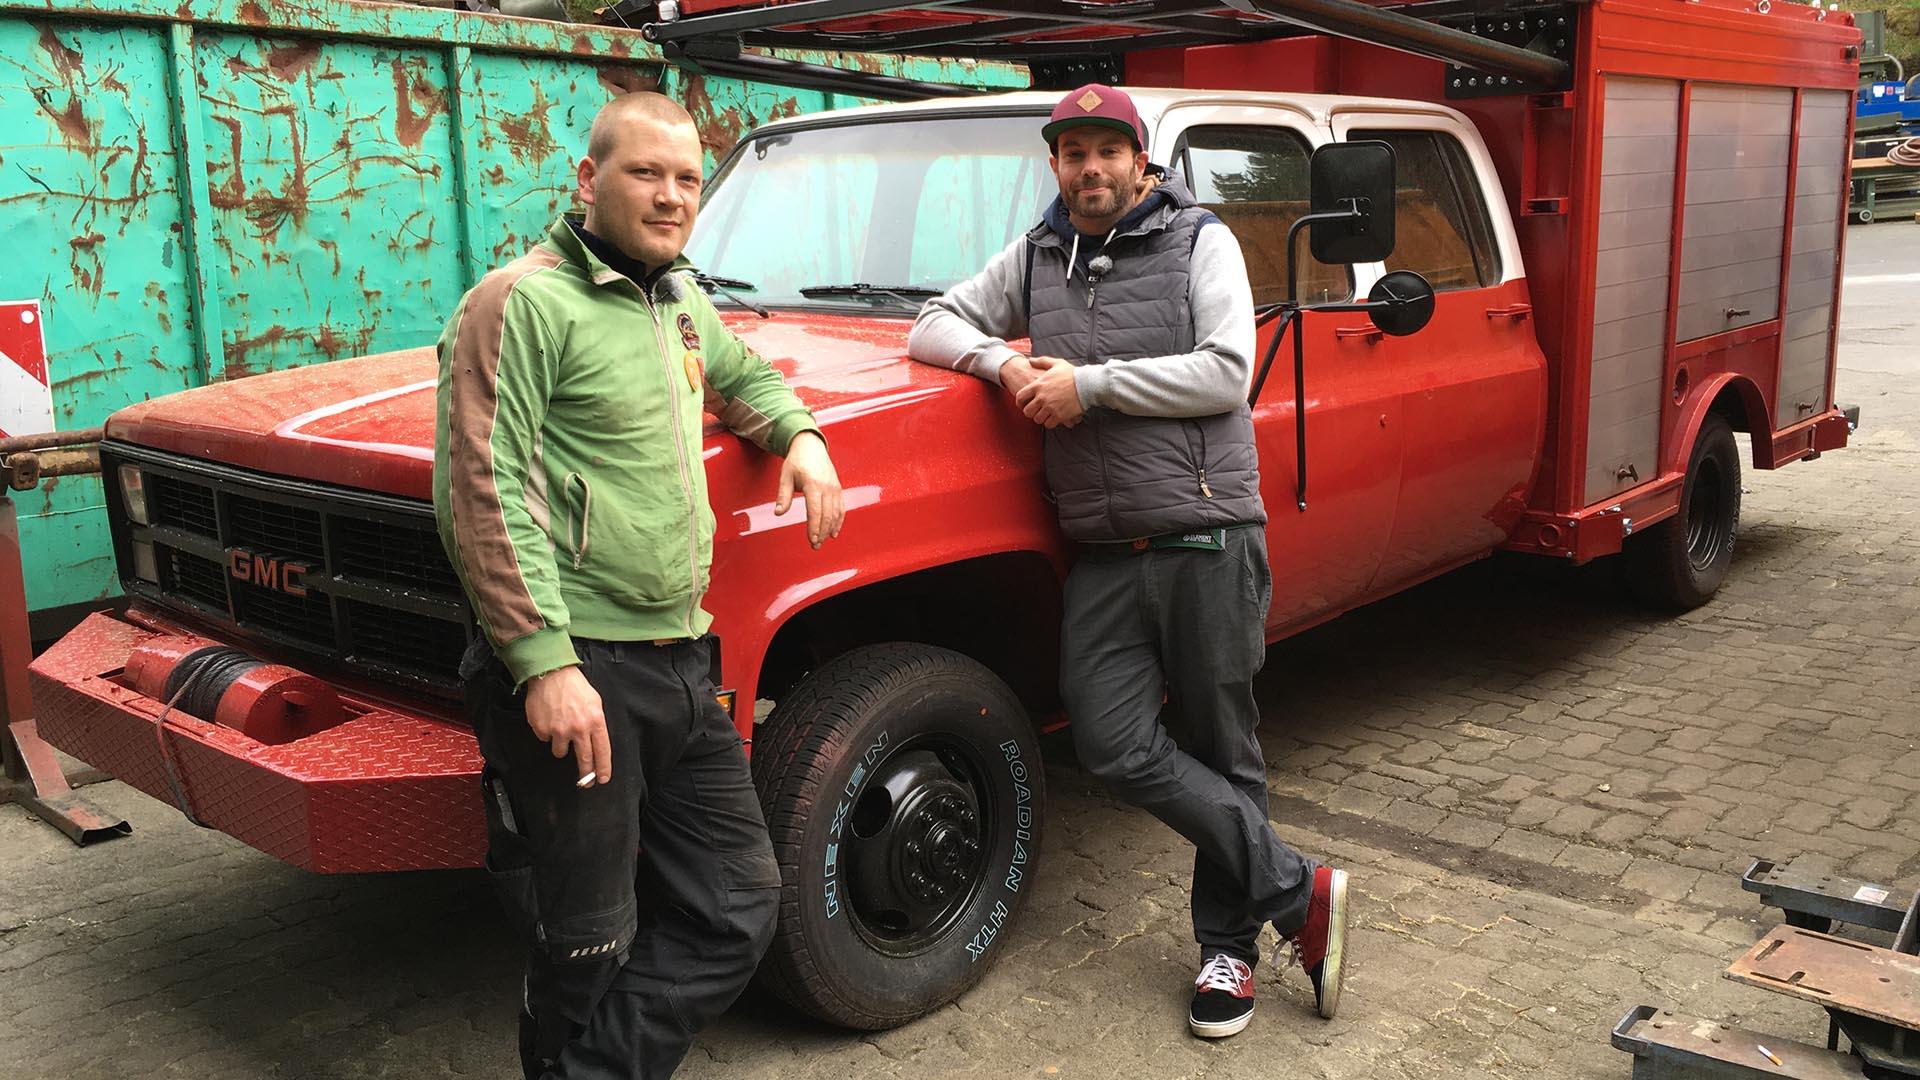 steel buddies s06 f03 der feuerrote party truck. Black Bedroom Furniture Sets. Home Design Ideas